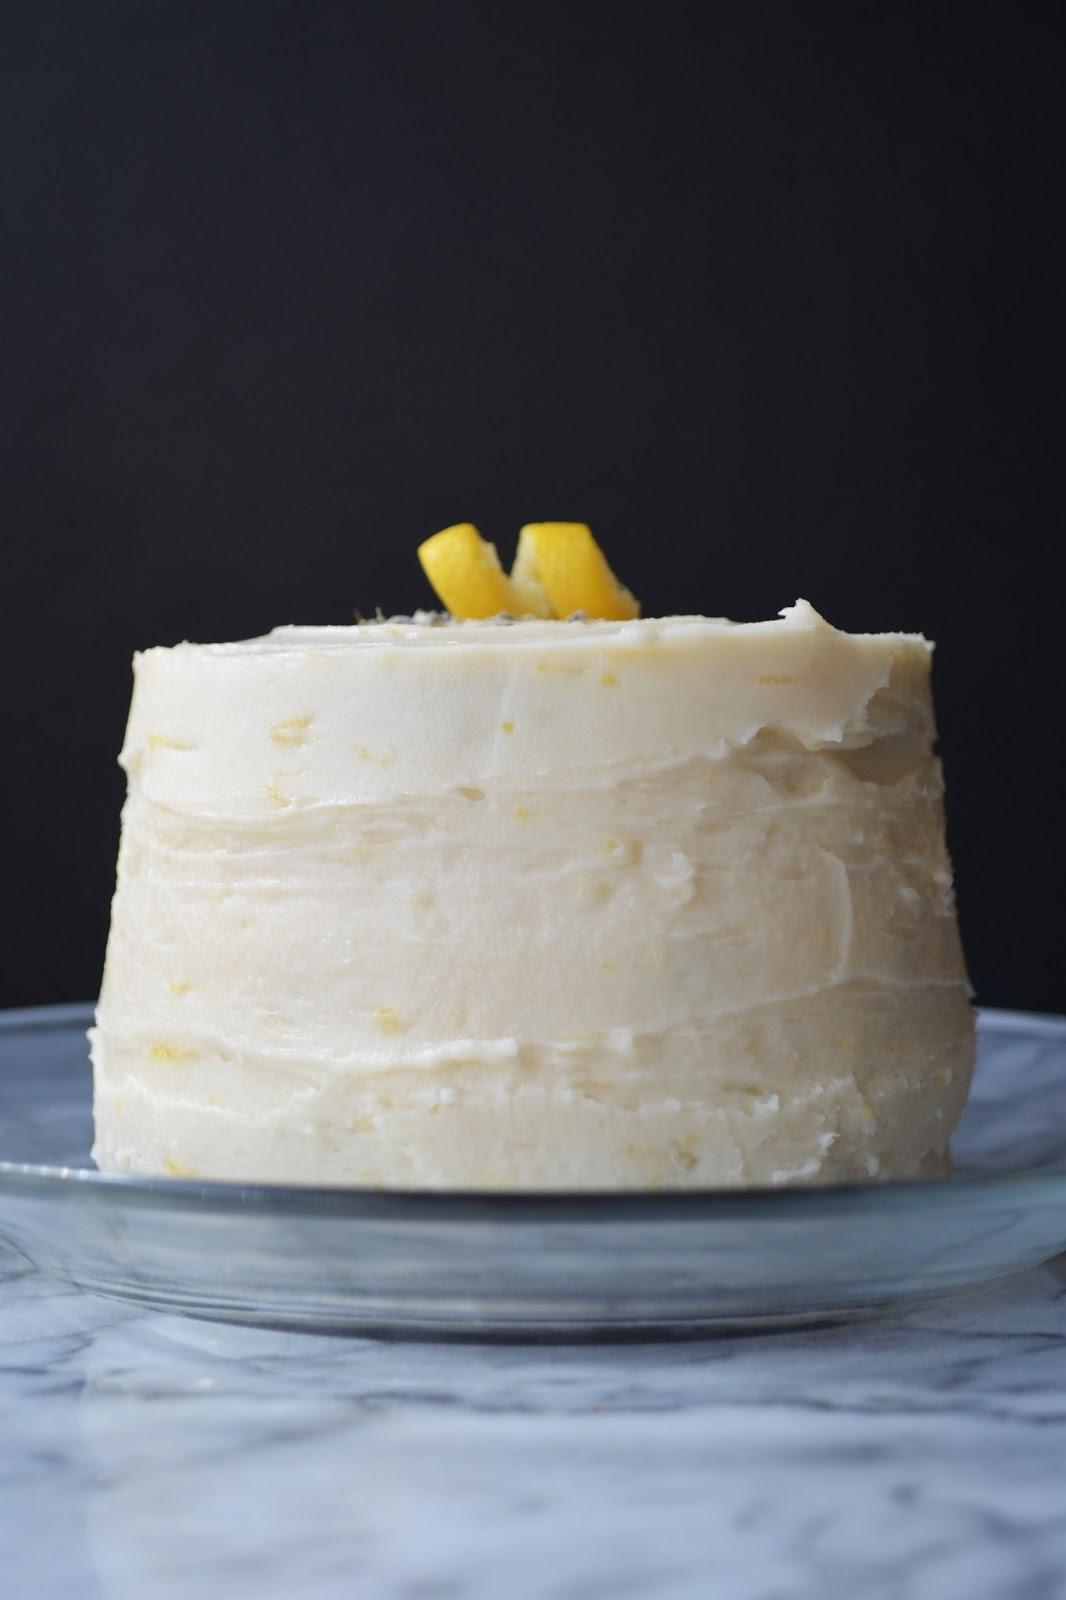 Gluten and Dairy Free Chocolaty Chocolate Cake & Lemon Buttercream Frosting